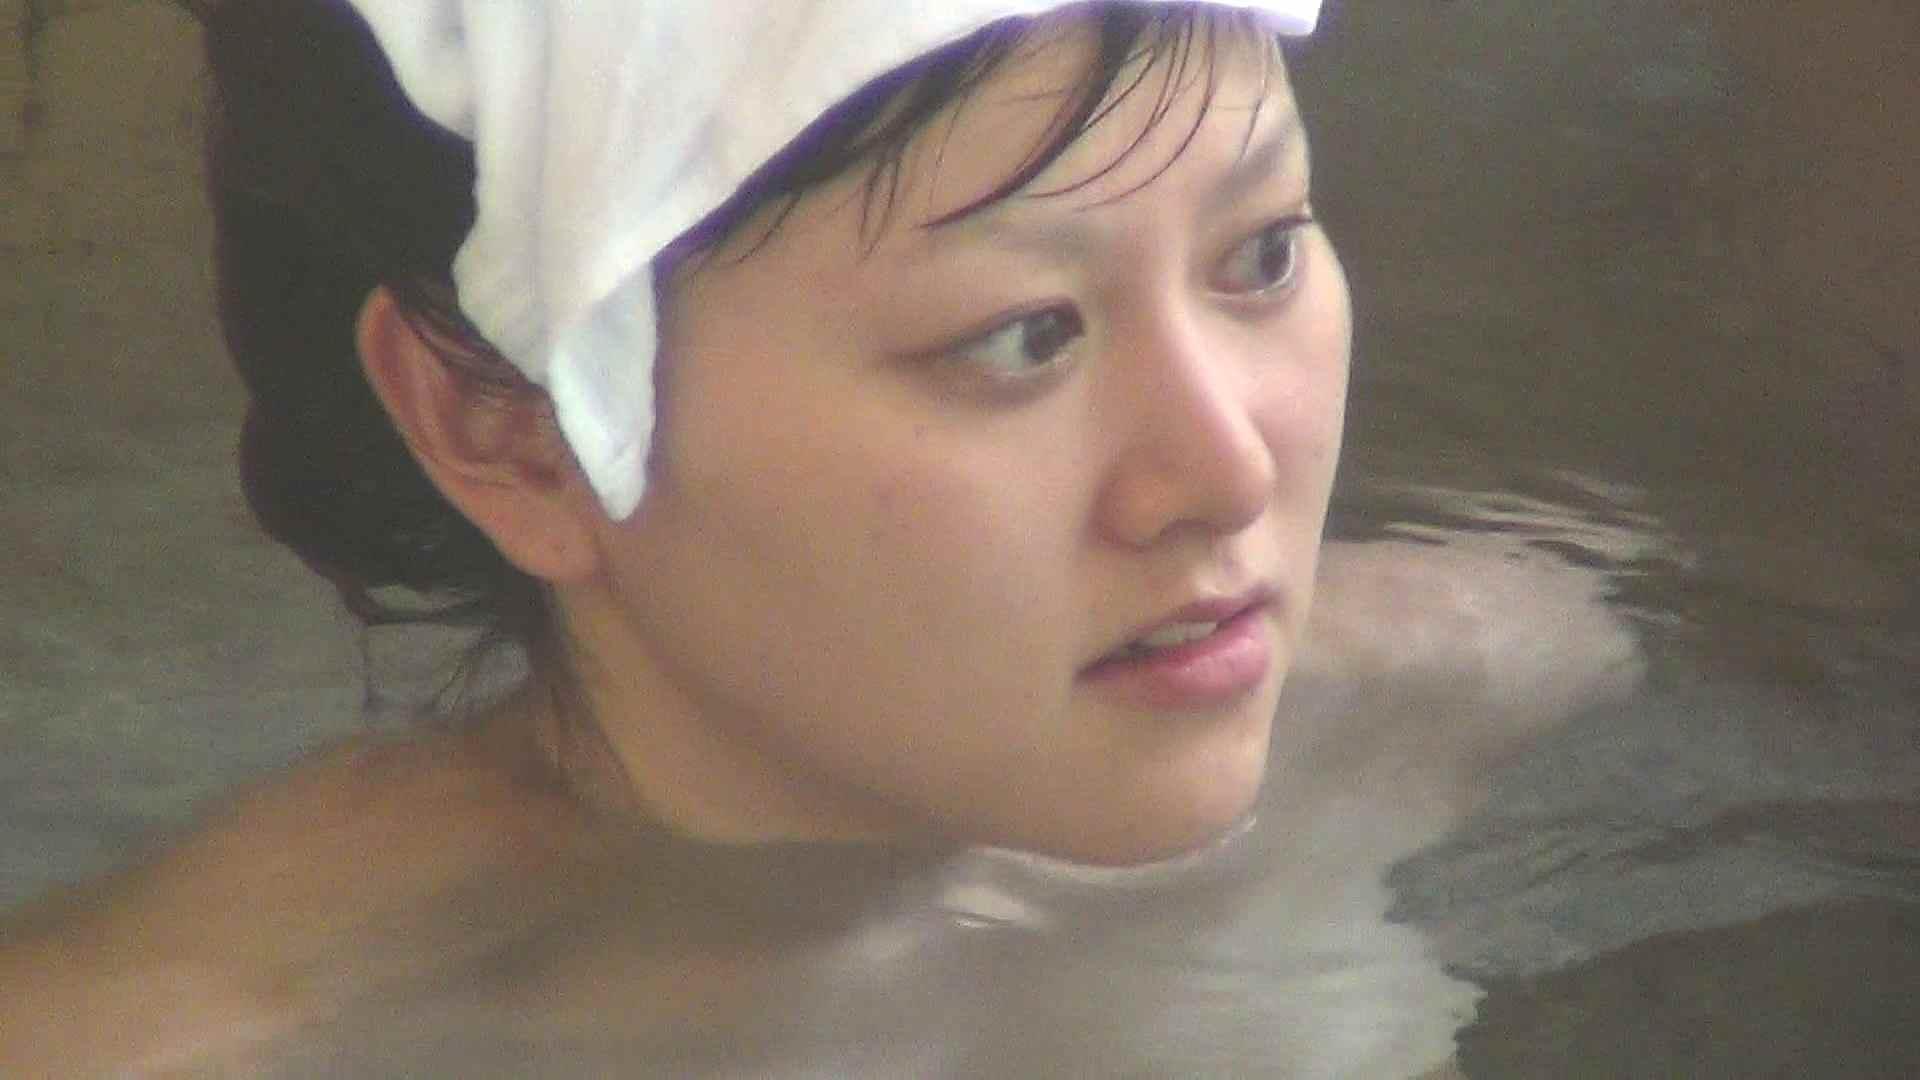 Aquaな露天風呂Vol.302 OLセックス 盗み撮りオマンコ動画キャプチャ 73画像 53